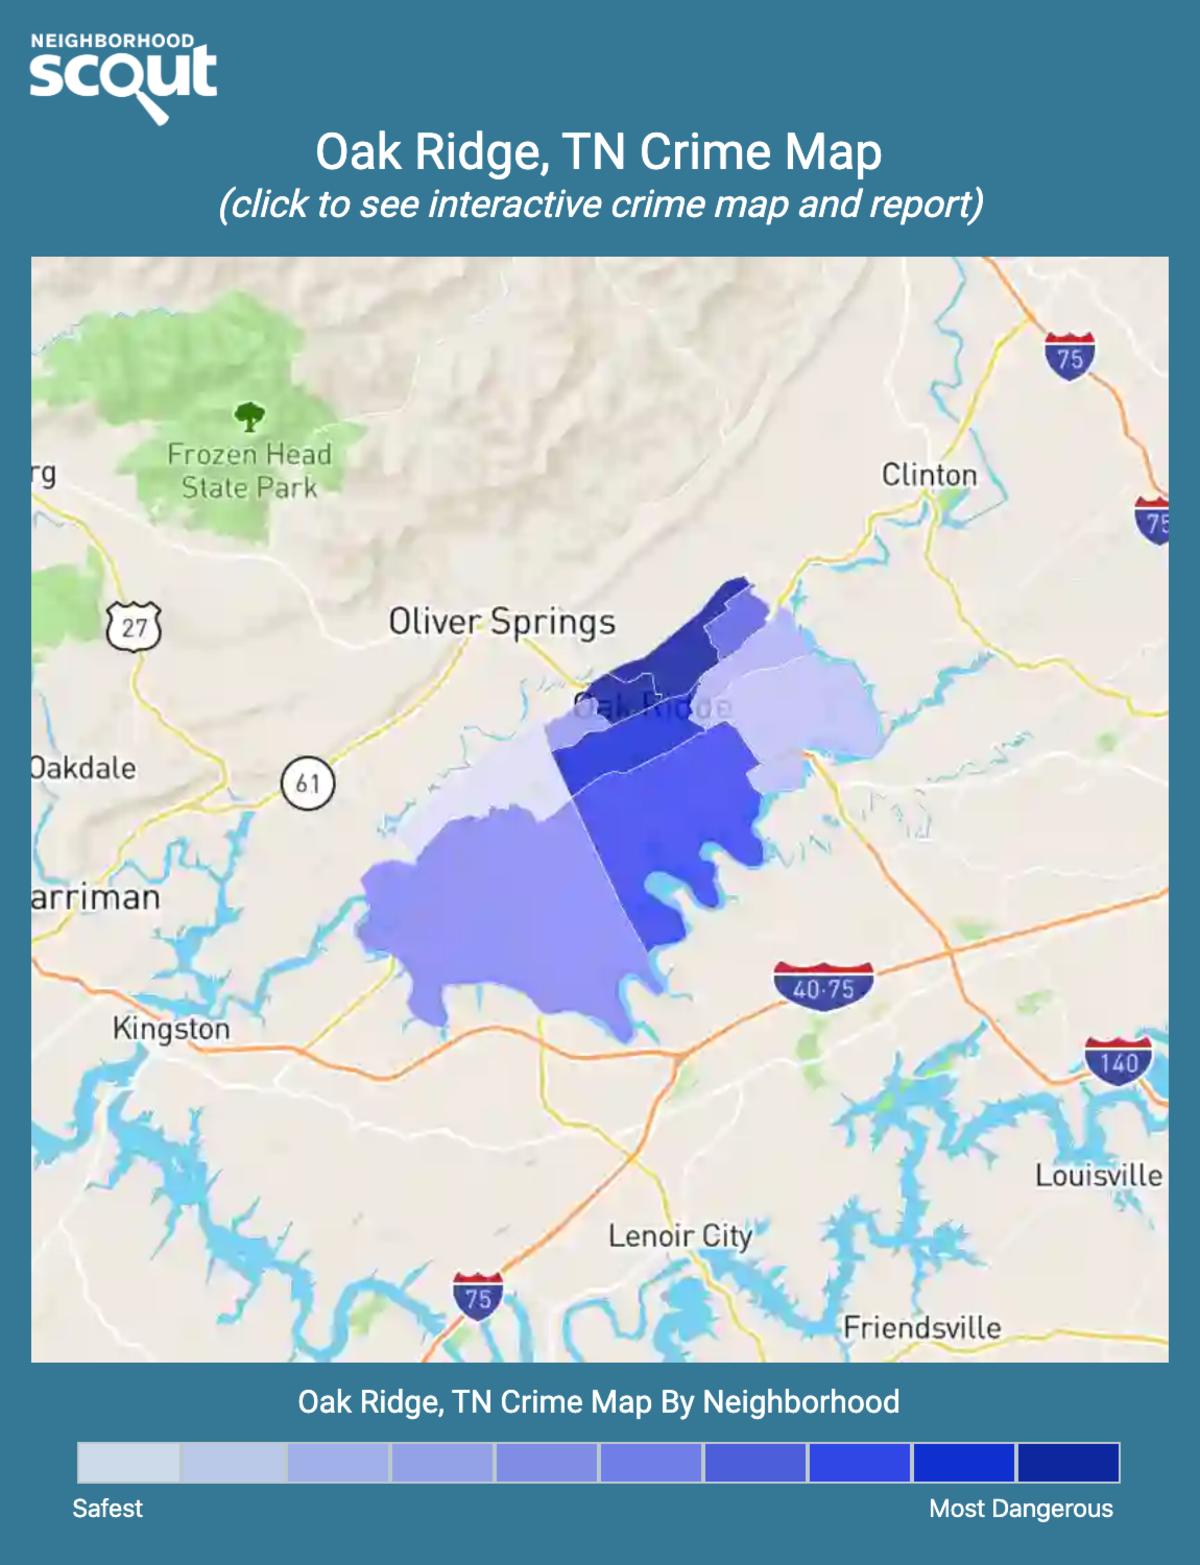 Oak Ridge, Tennessee crime map